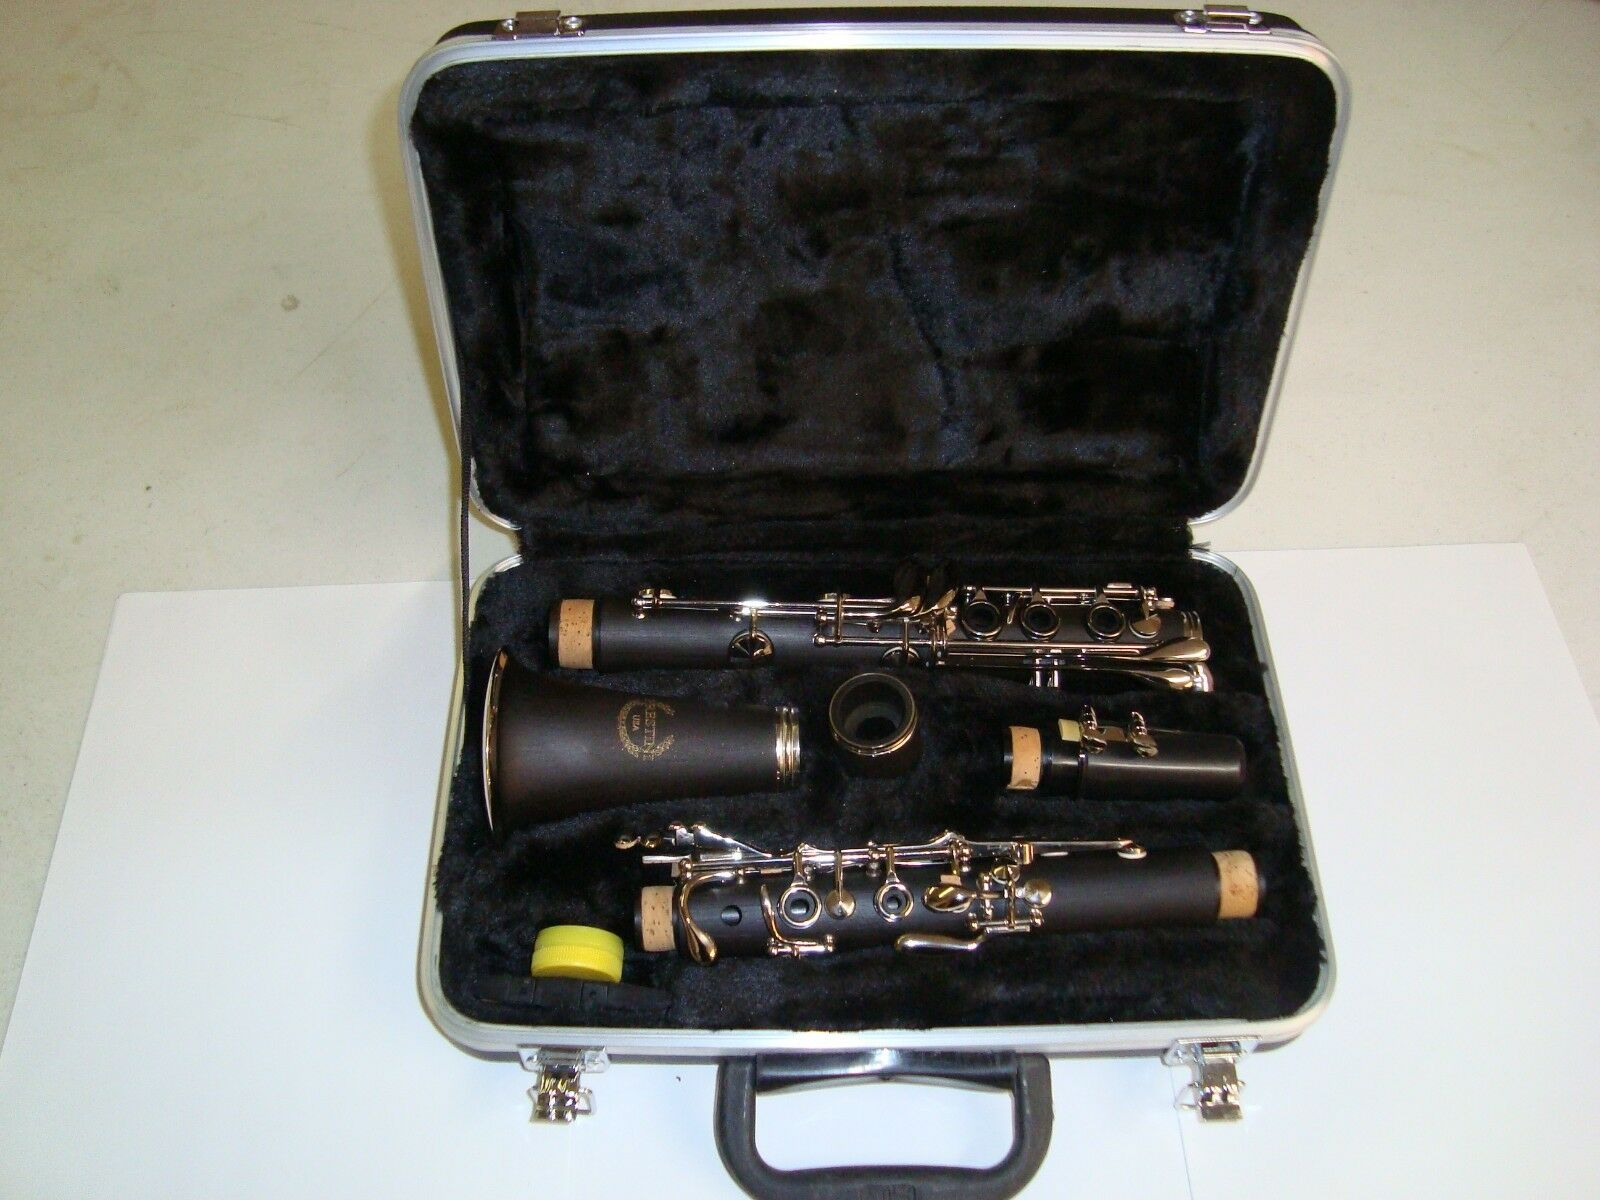 Bb Clarinet Prestini ABS Plastic and nickel plated keys